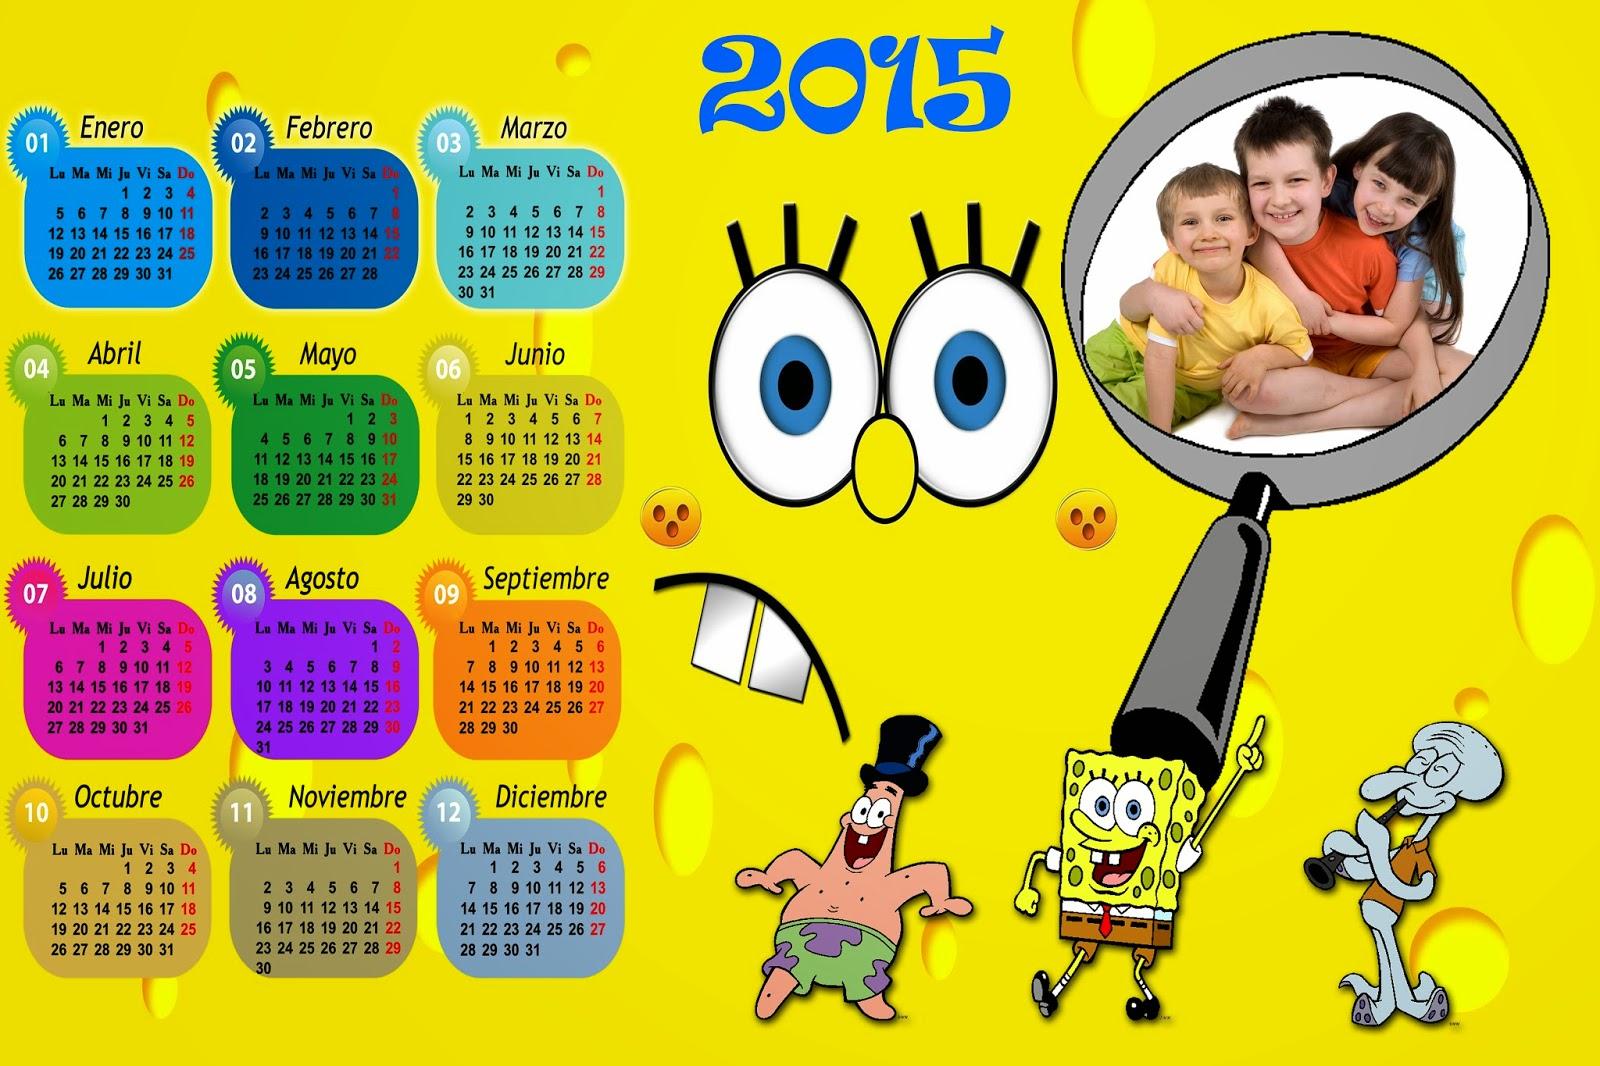 Mayan Gender Calendar 2015